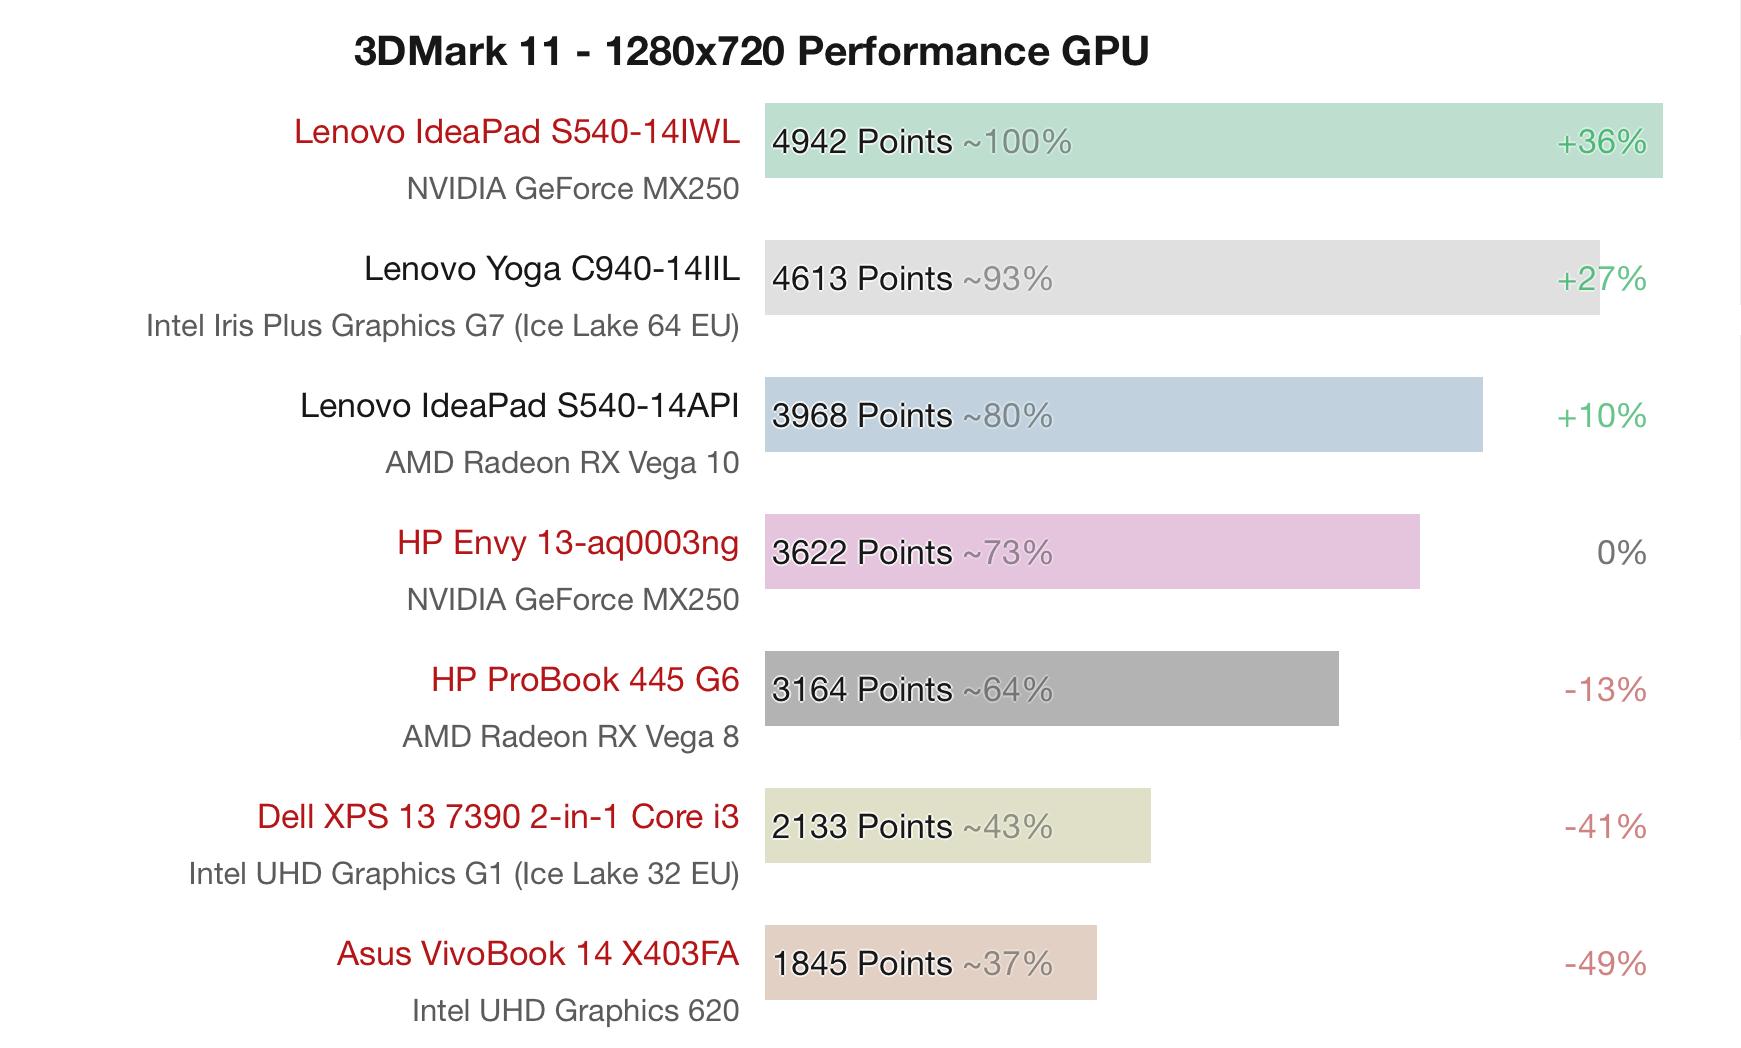 Intel Iris Plus Graphics G7 Igpu Gives Amd Rx Vega 10 A Run For Its Money